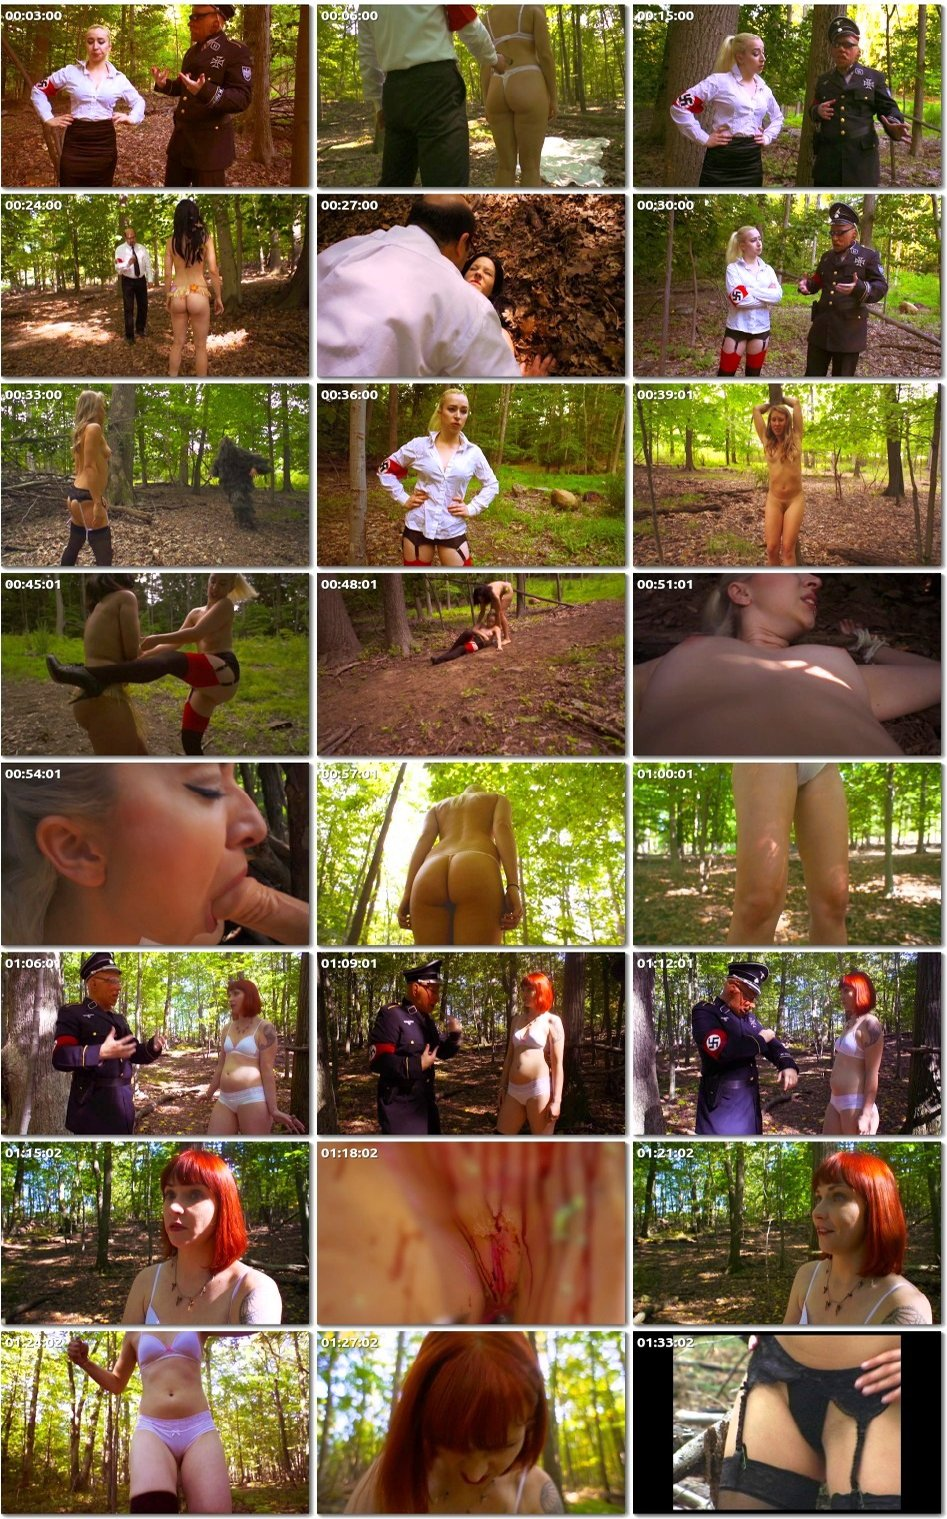 Misty Mundae Sex Video